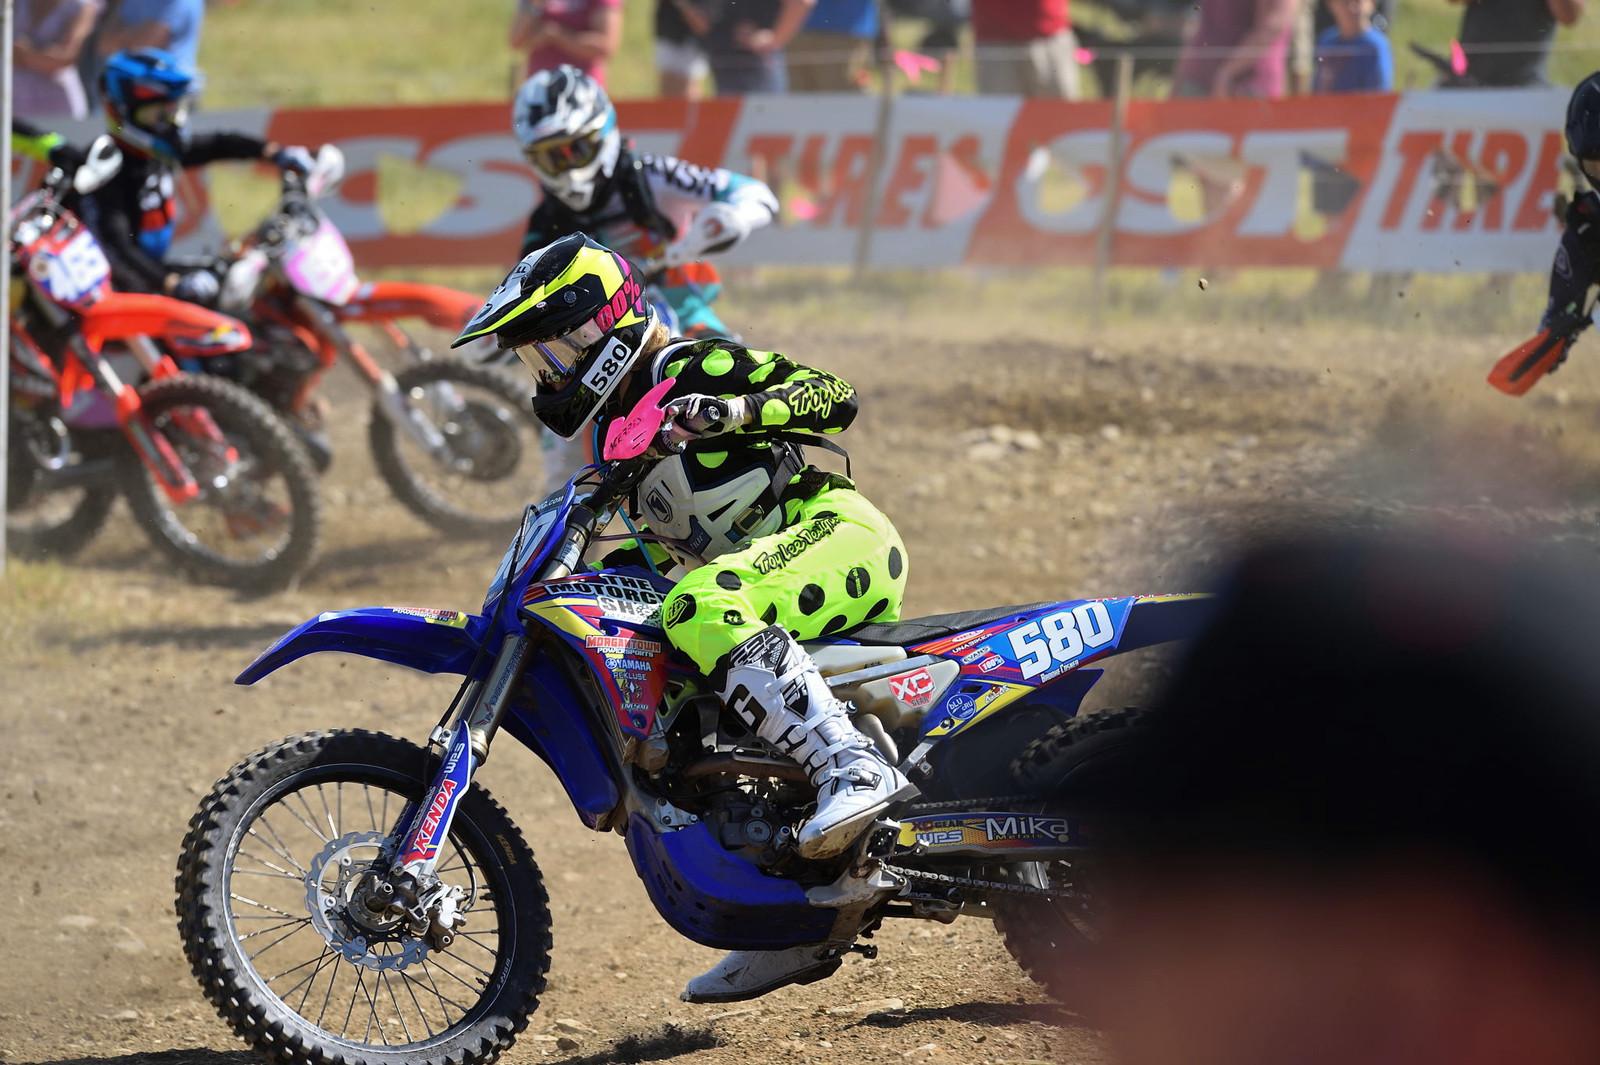 Brooke Cosner - Tomahawk GNCC - Motocross Pictures - Vital MX